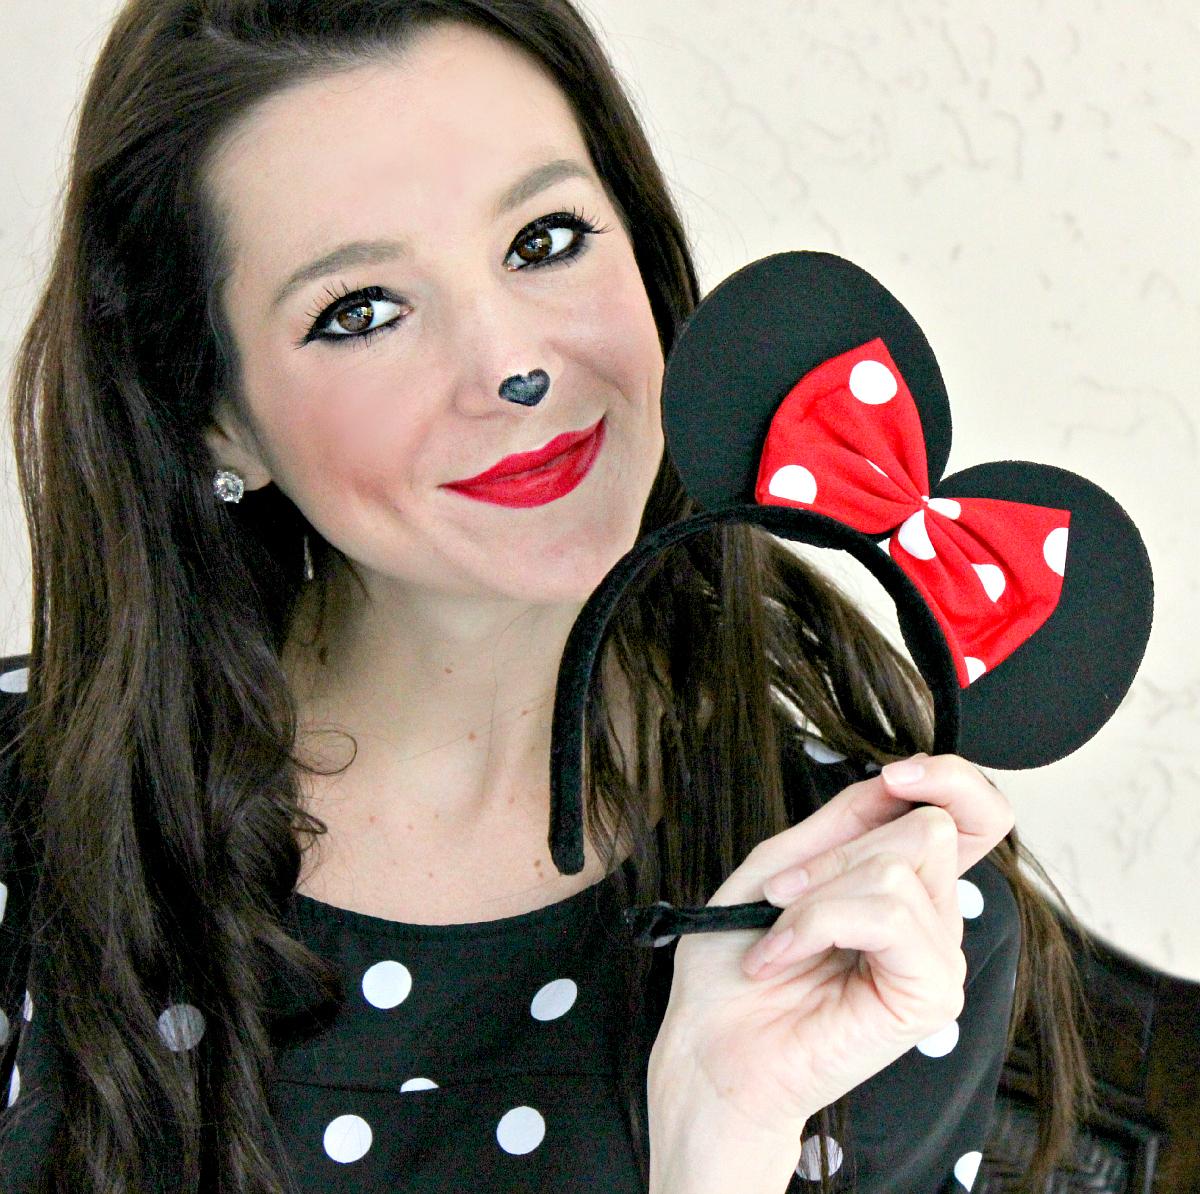 Neutrogena, Halloween Makeup, Minnie Mouse Makeup, Stephanie Ziajka, Diary of a Debutante